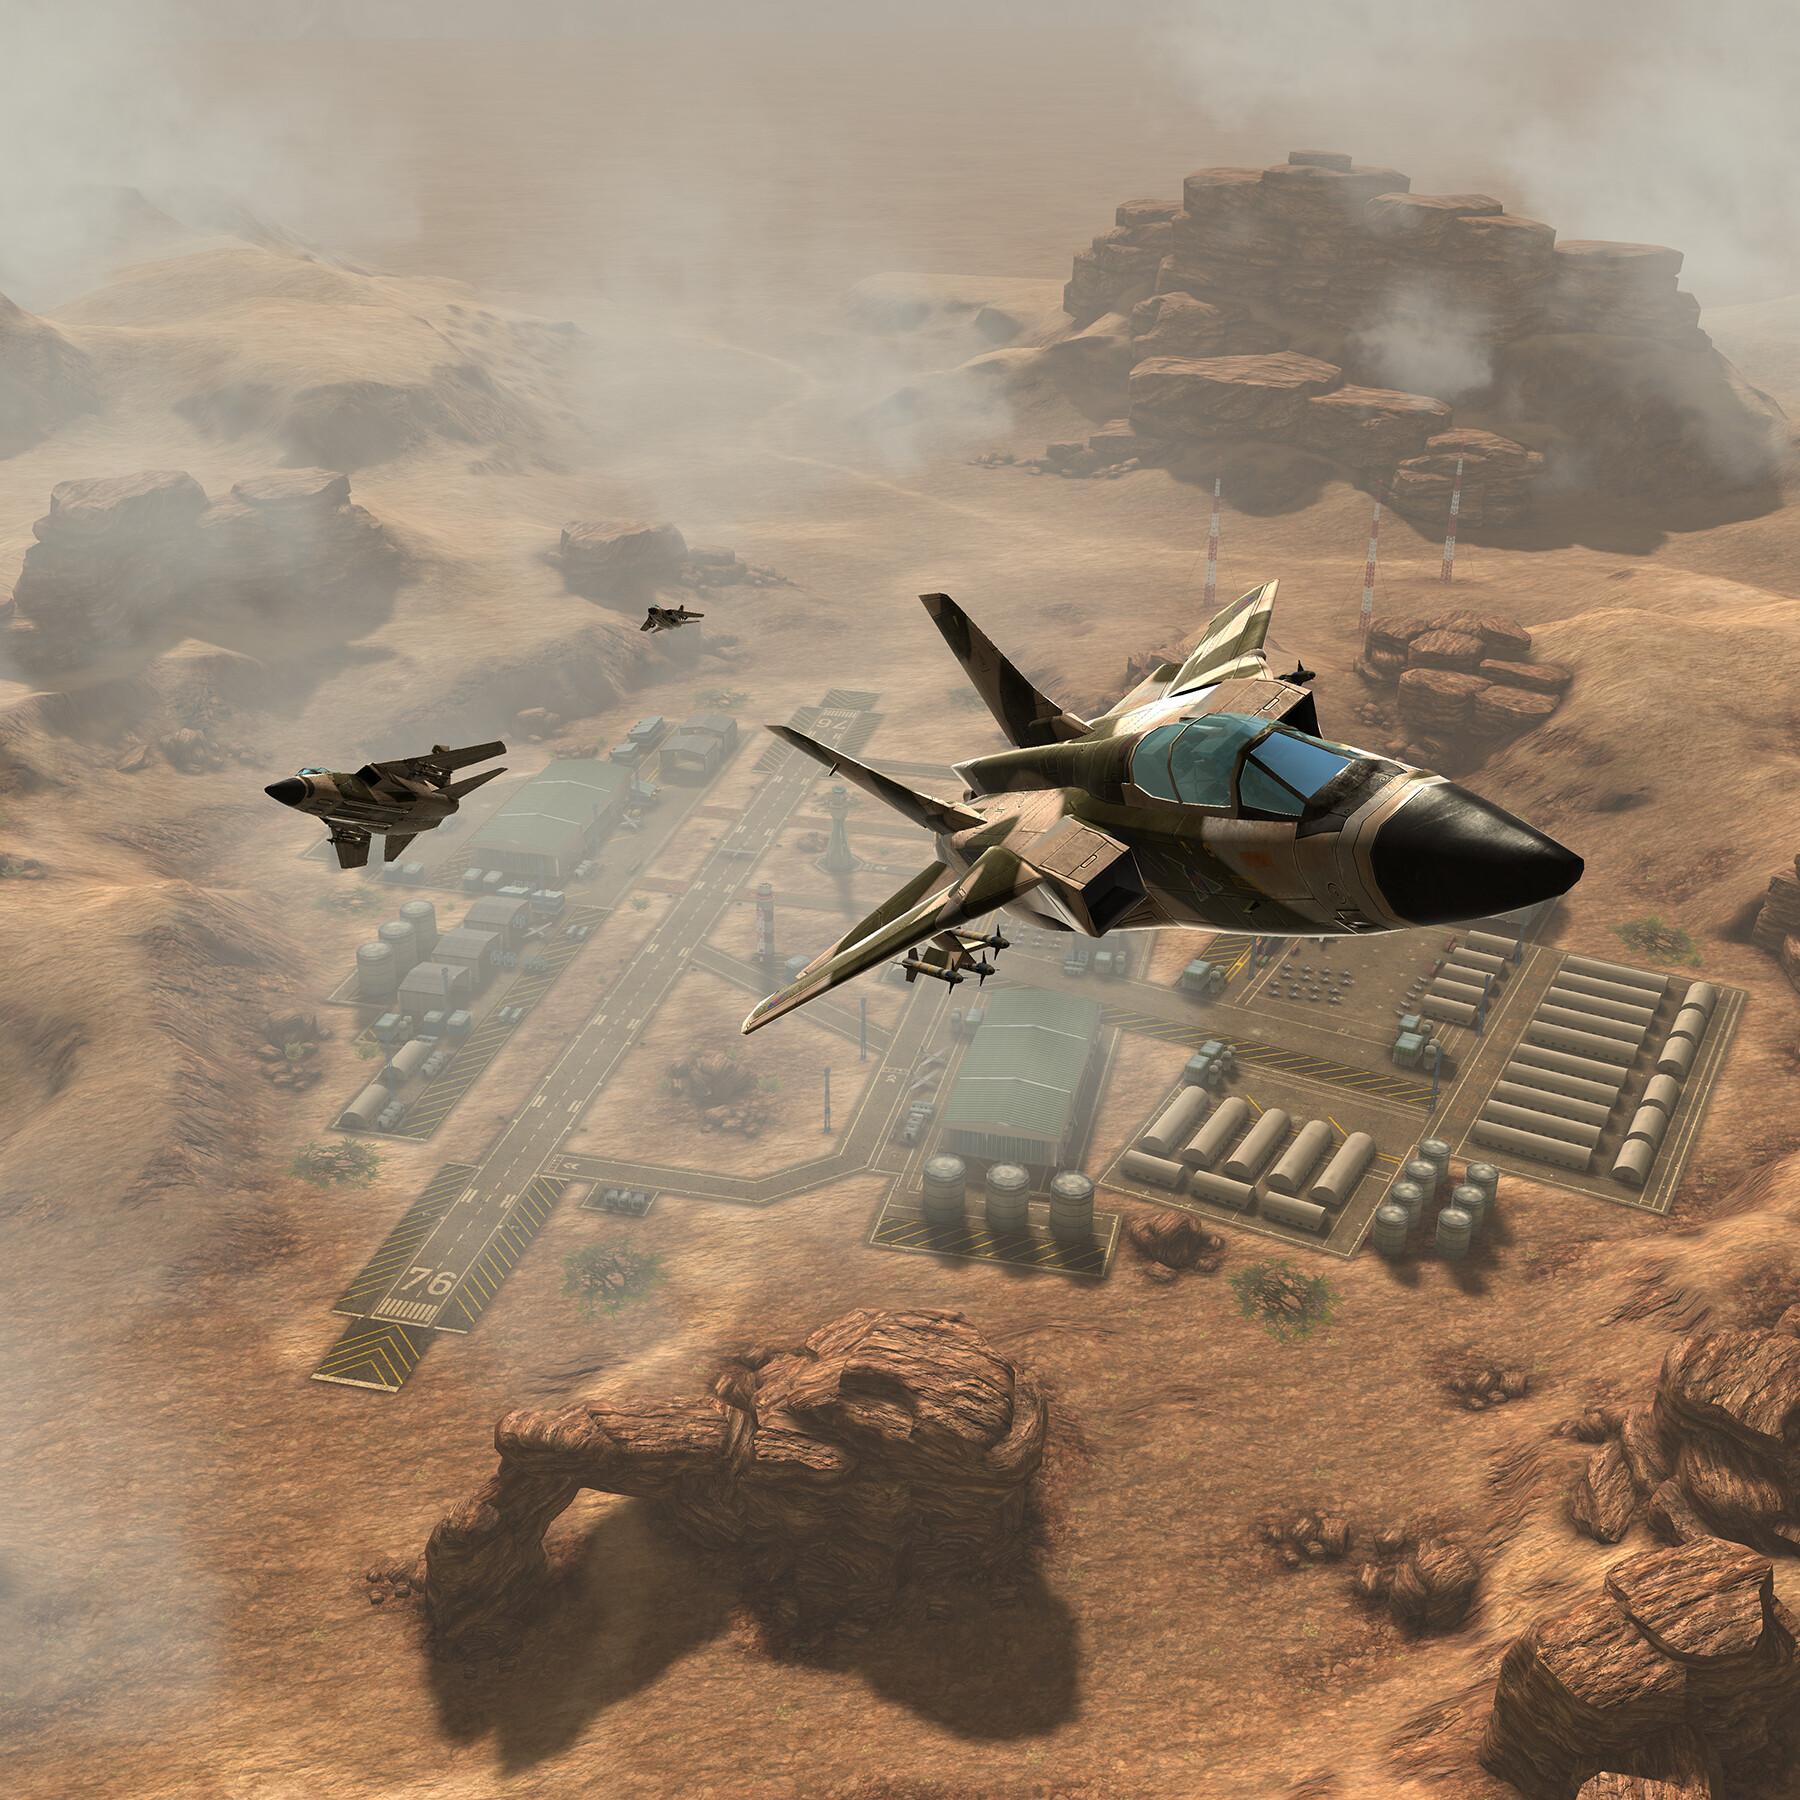 Desert deployment.